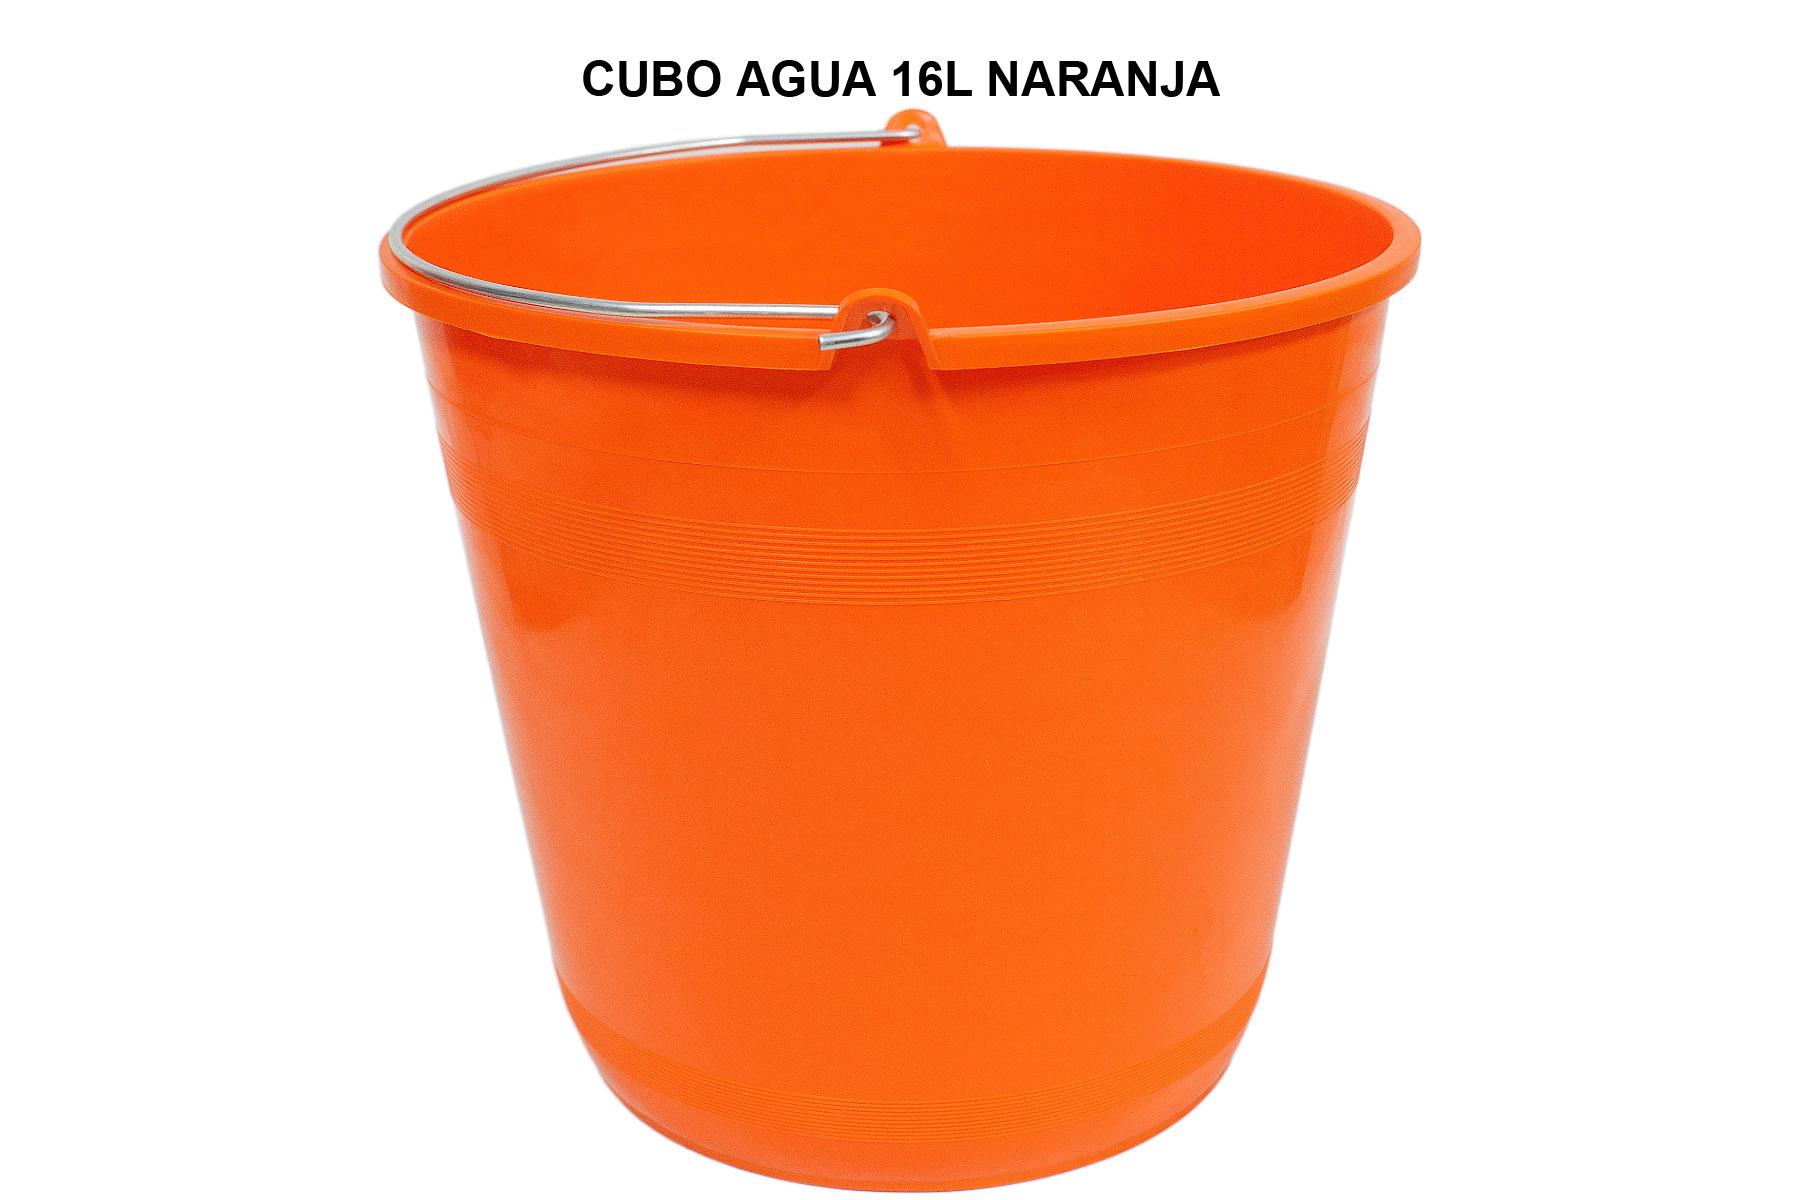 CUBO 16L NARANJA